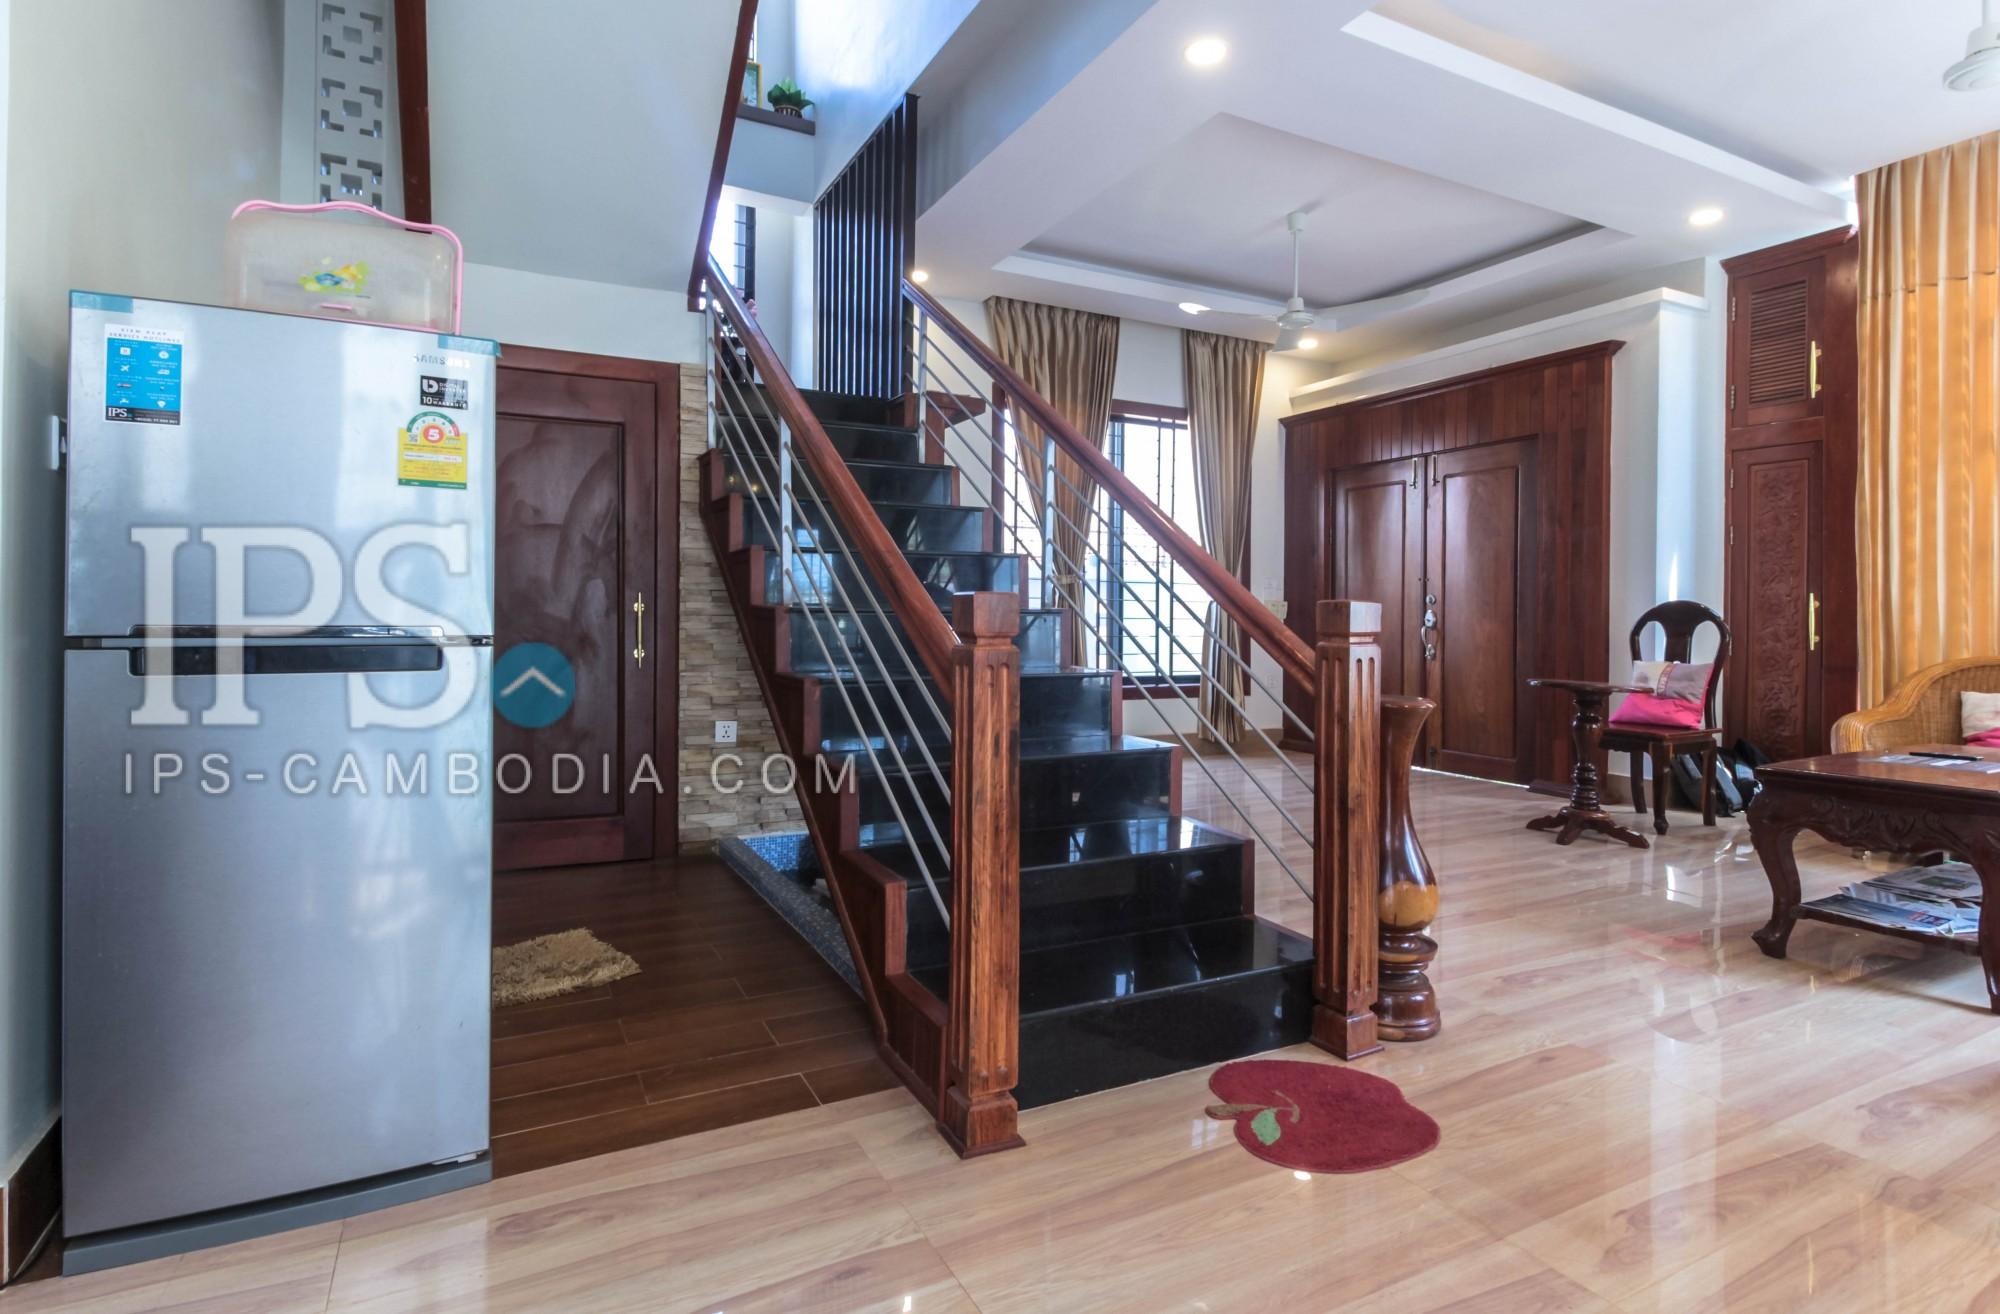 Villa 3 Bedrooms For Sale -  Chreav, Siem Reap